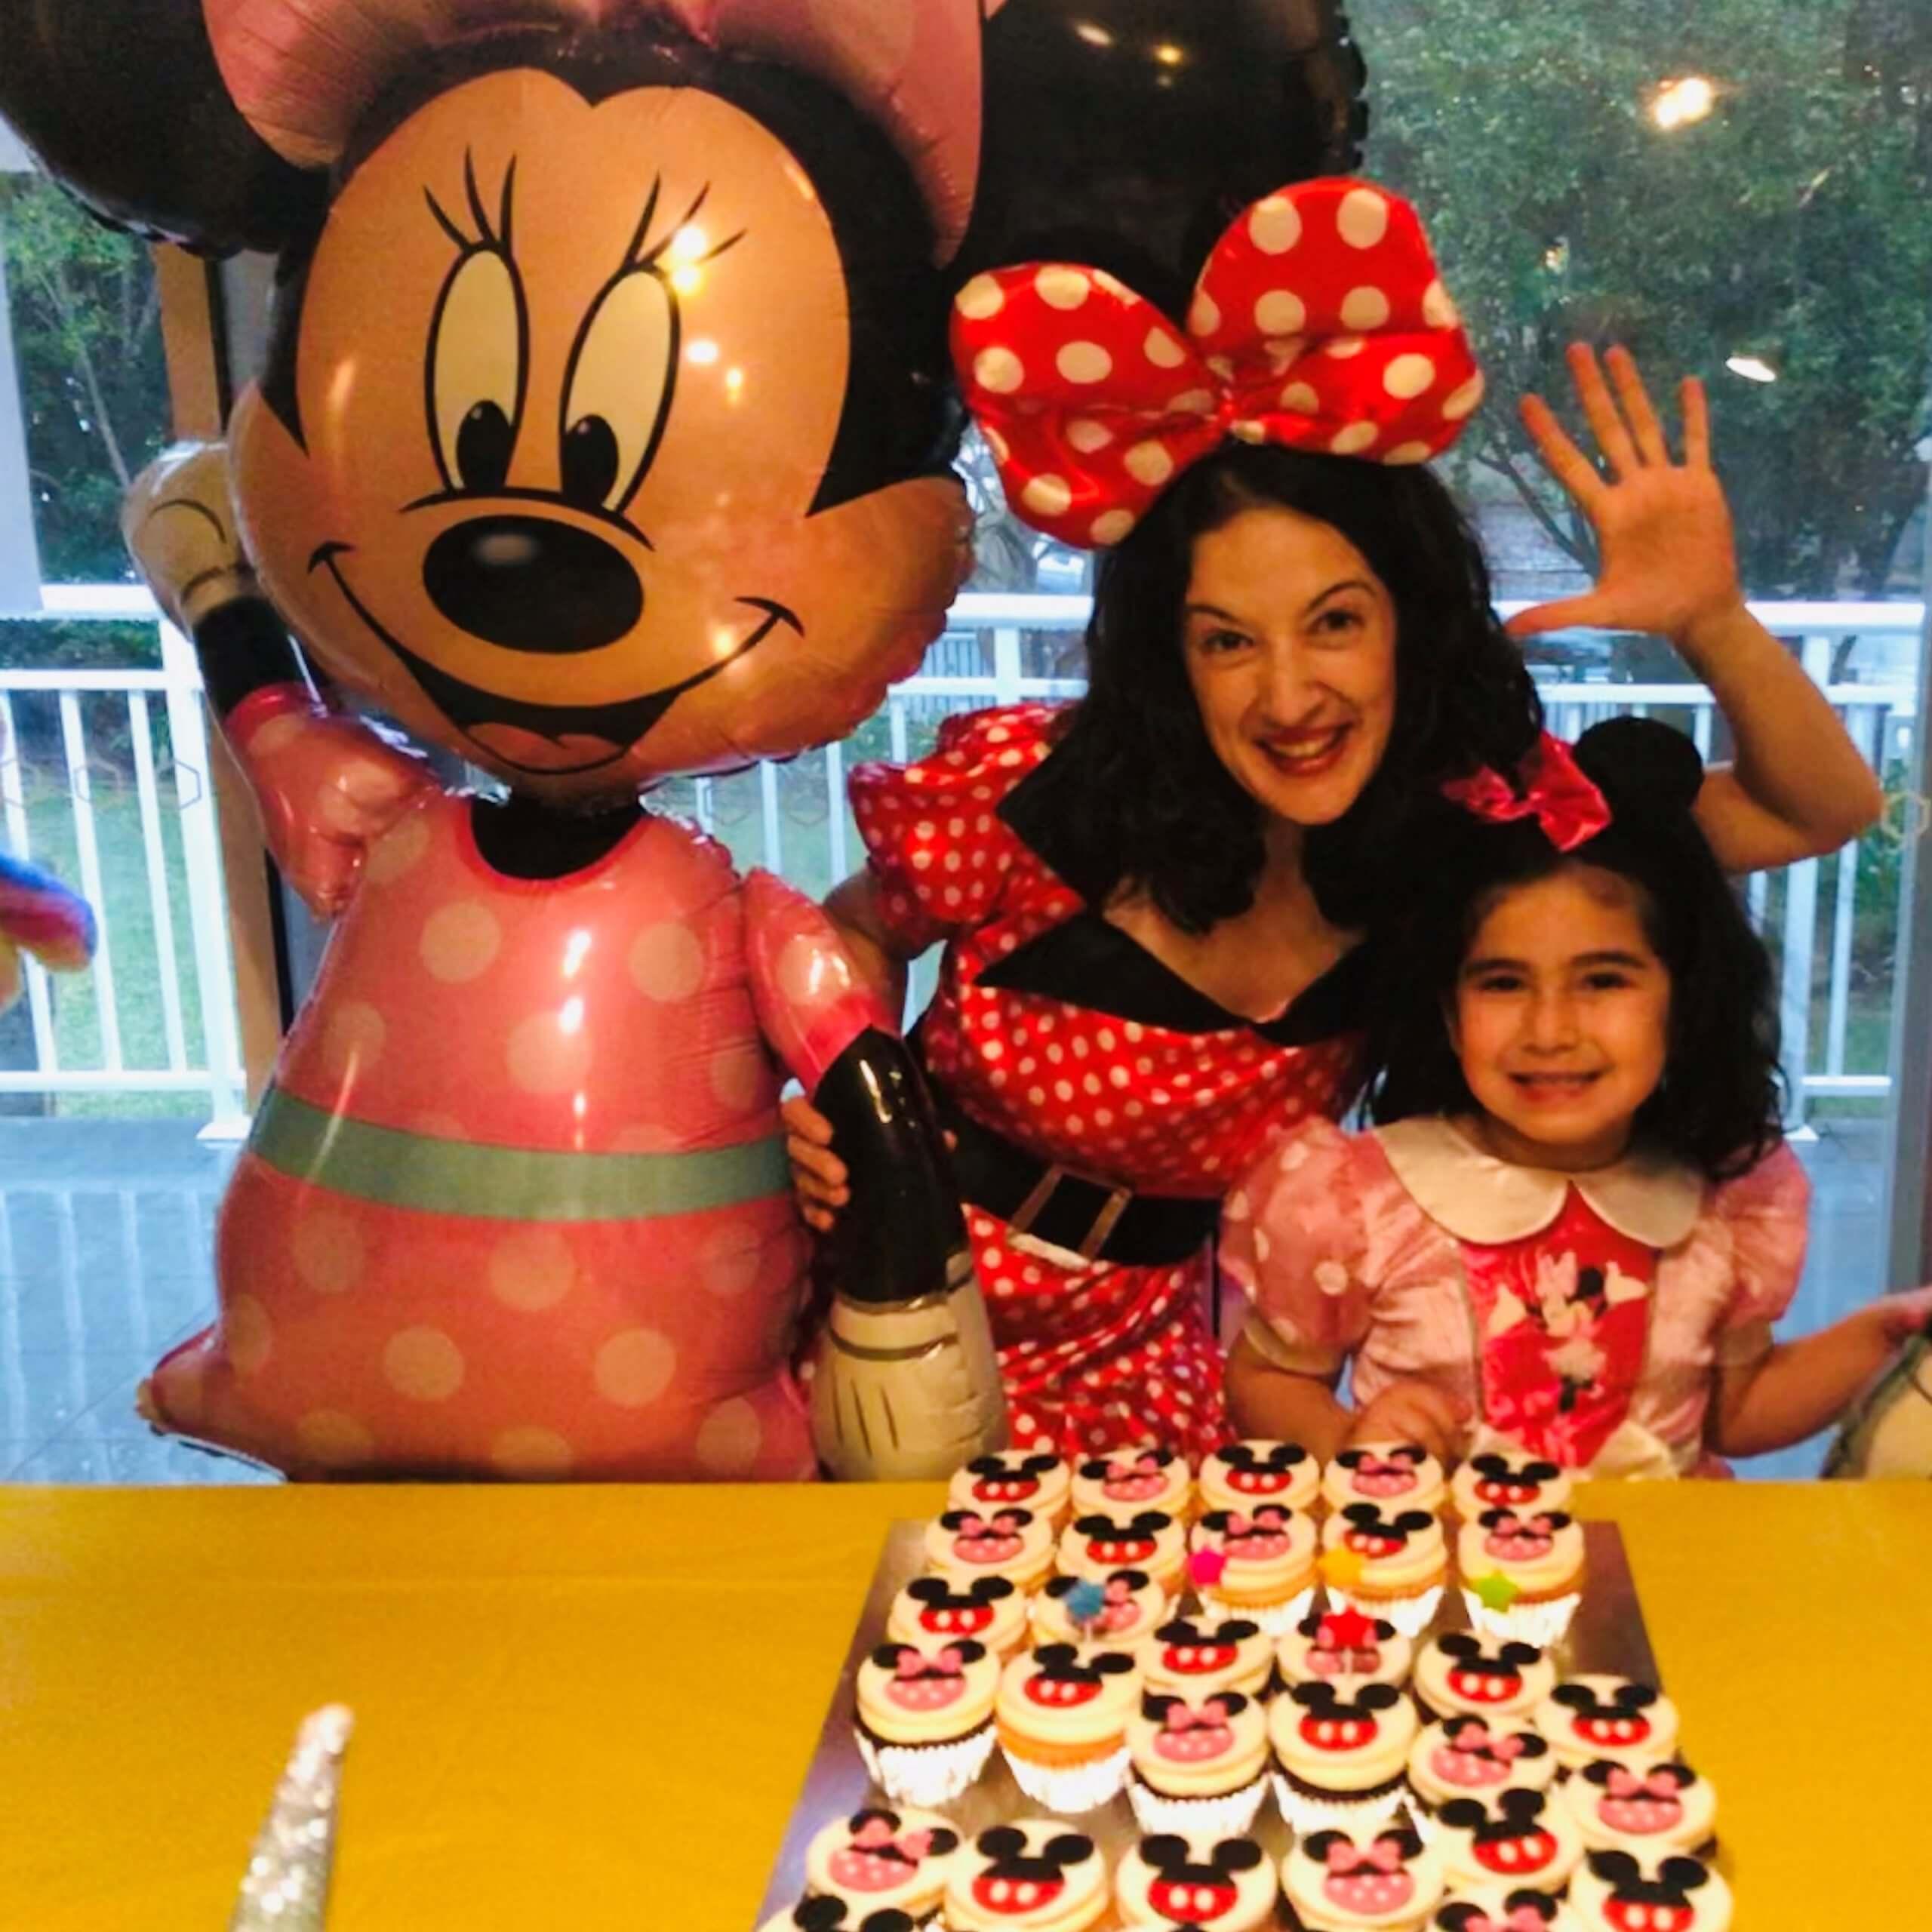 Children's Minnie Mouse Party